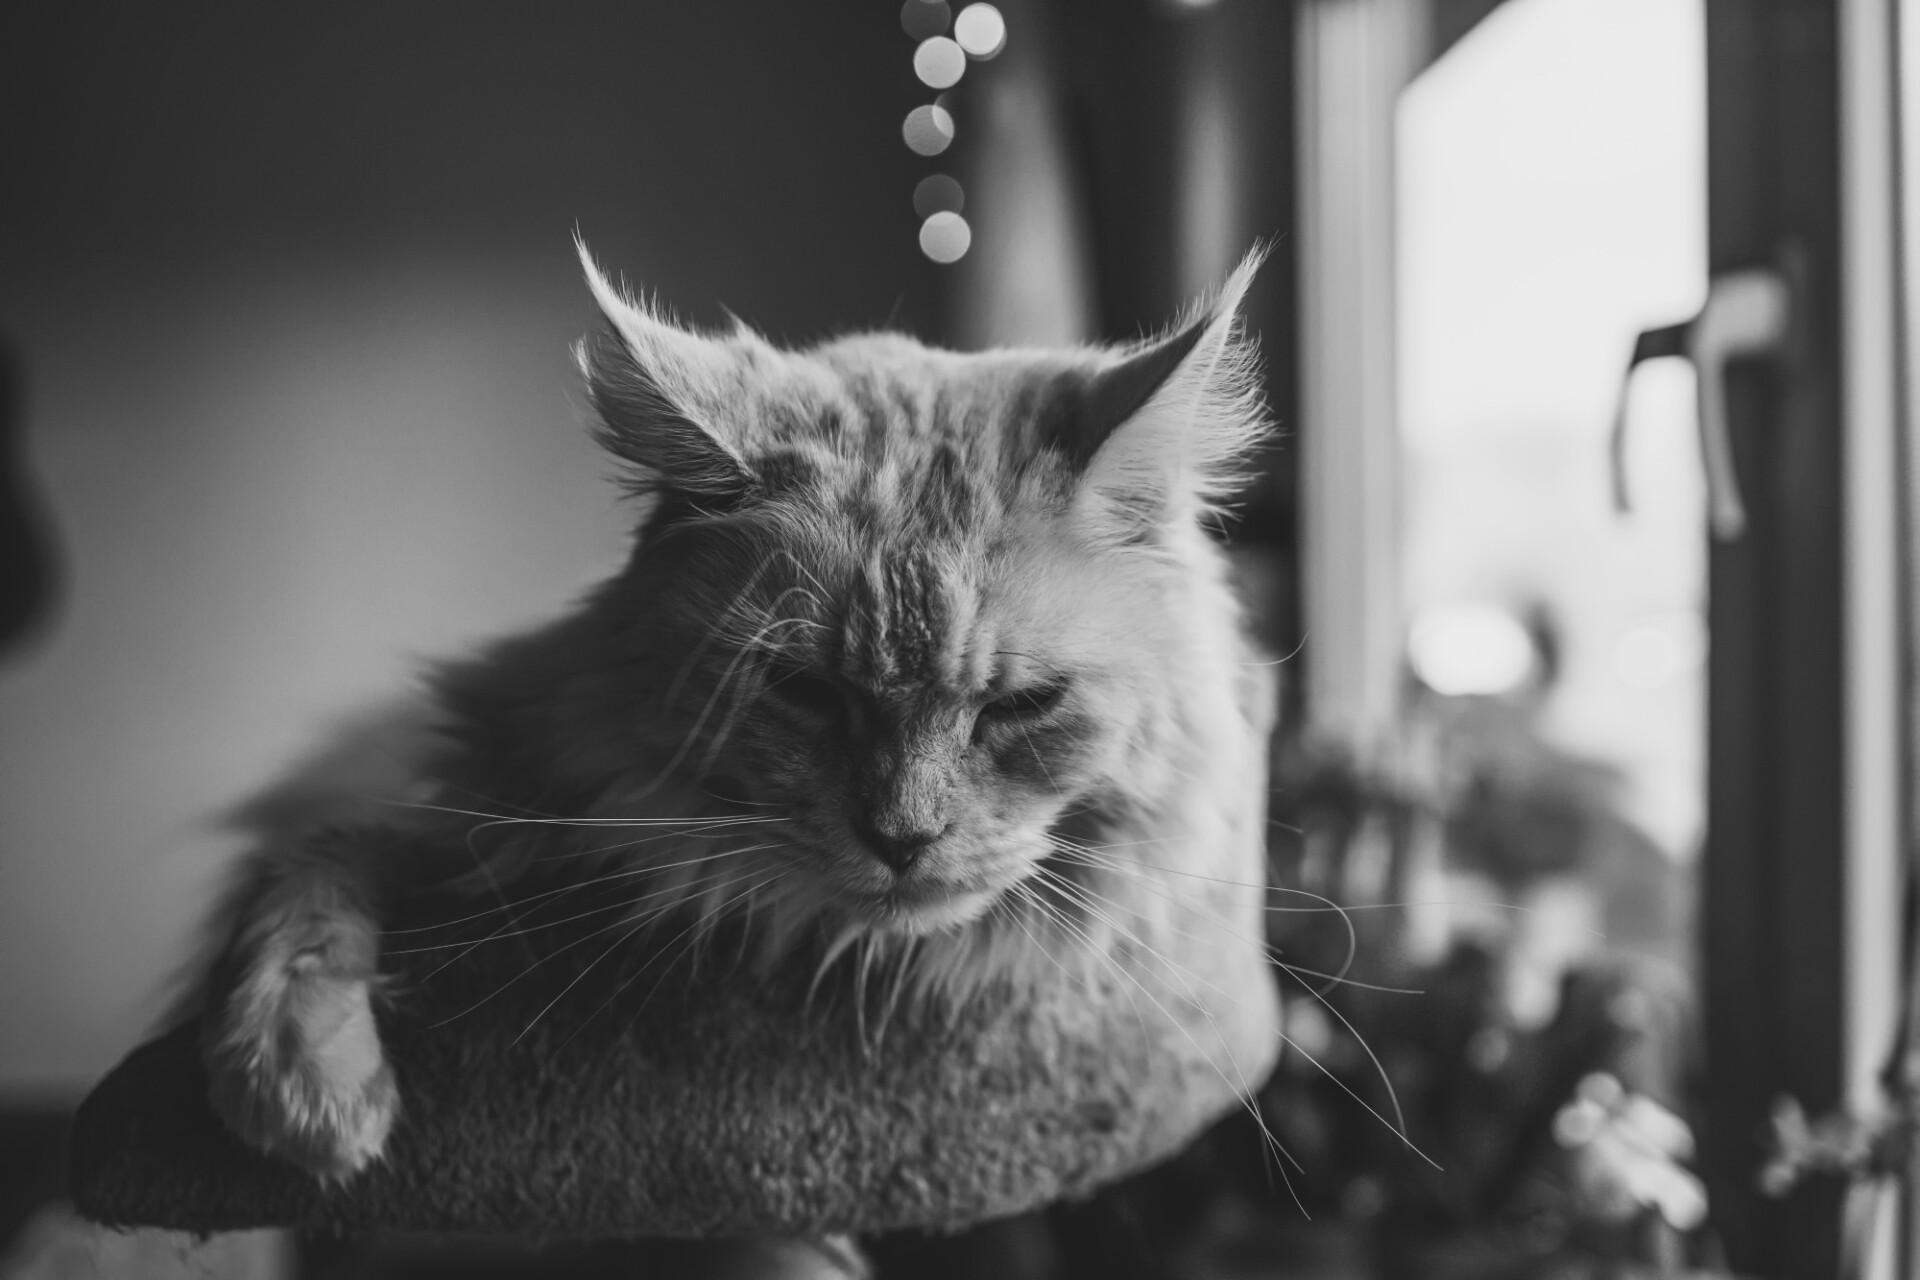 Cat lies on scratching post